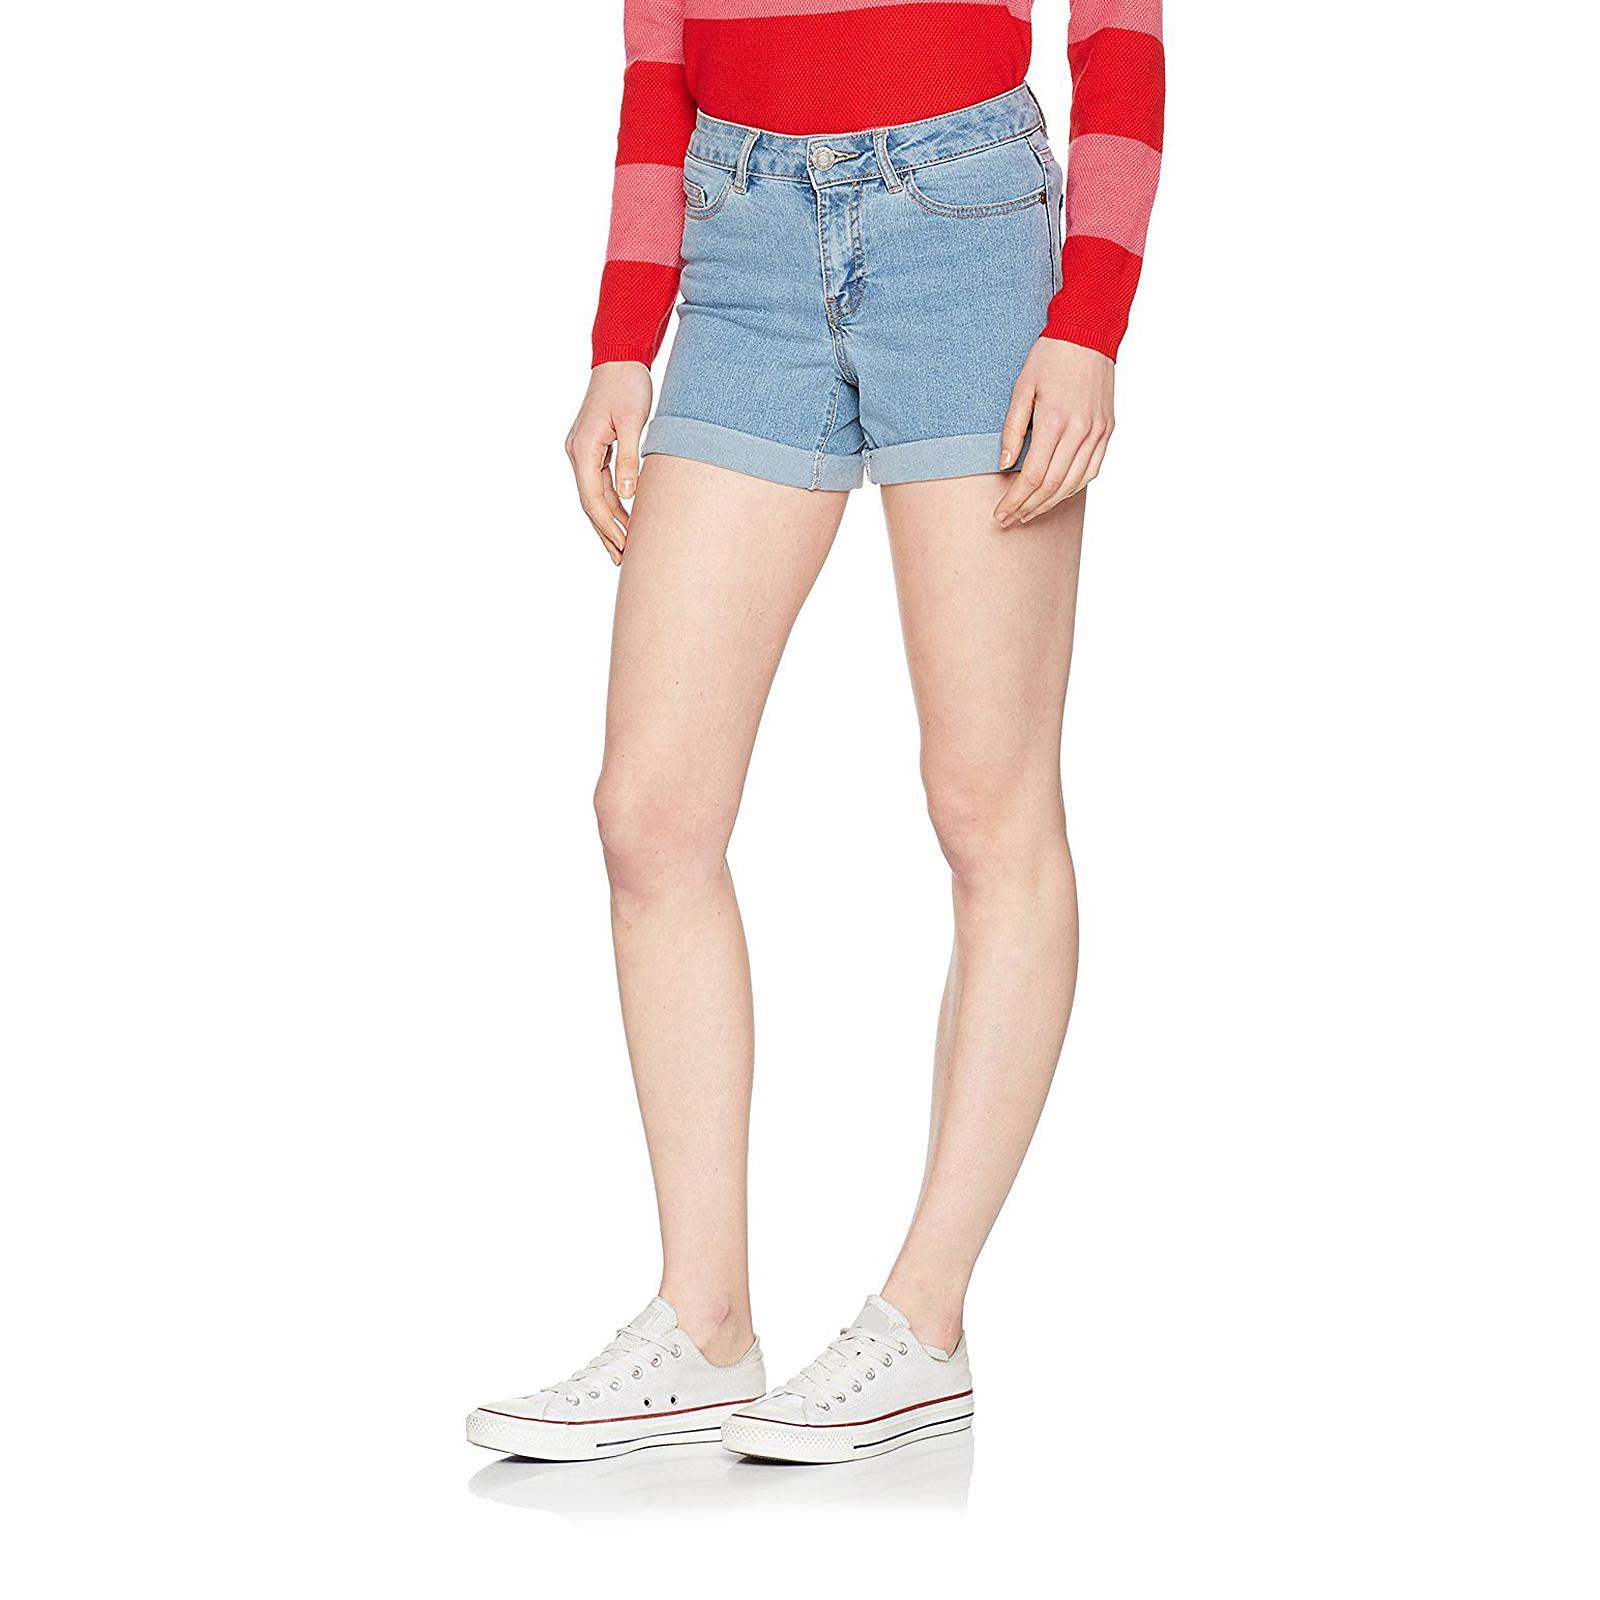 Dettagli su Noisy May Shorts Nmbe Lucy Nw Den Fold Shorts Gu818 Noos Light Blue Denim